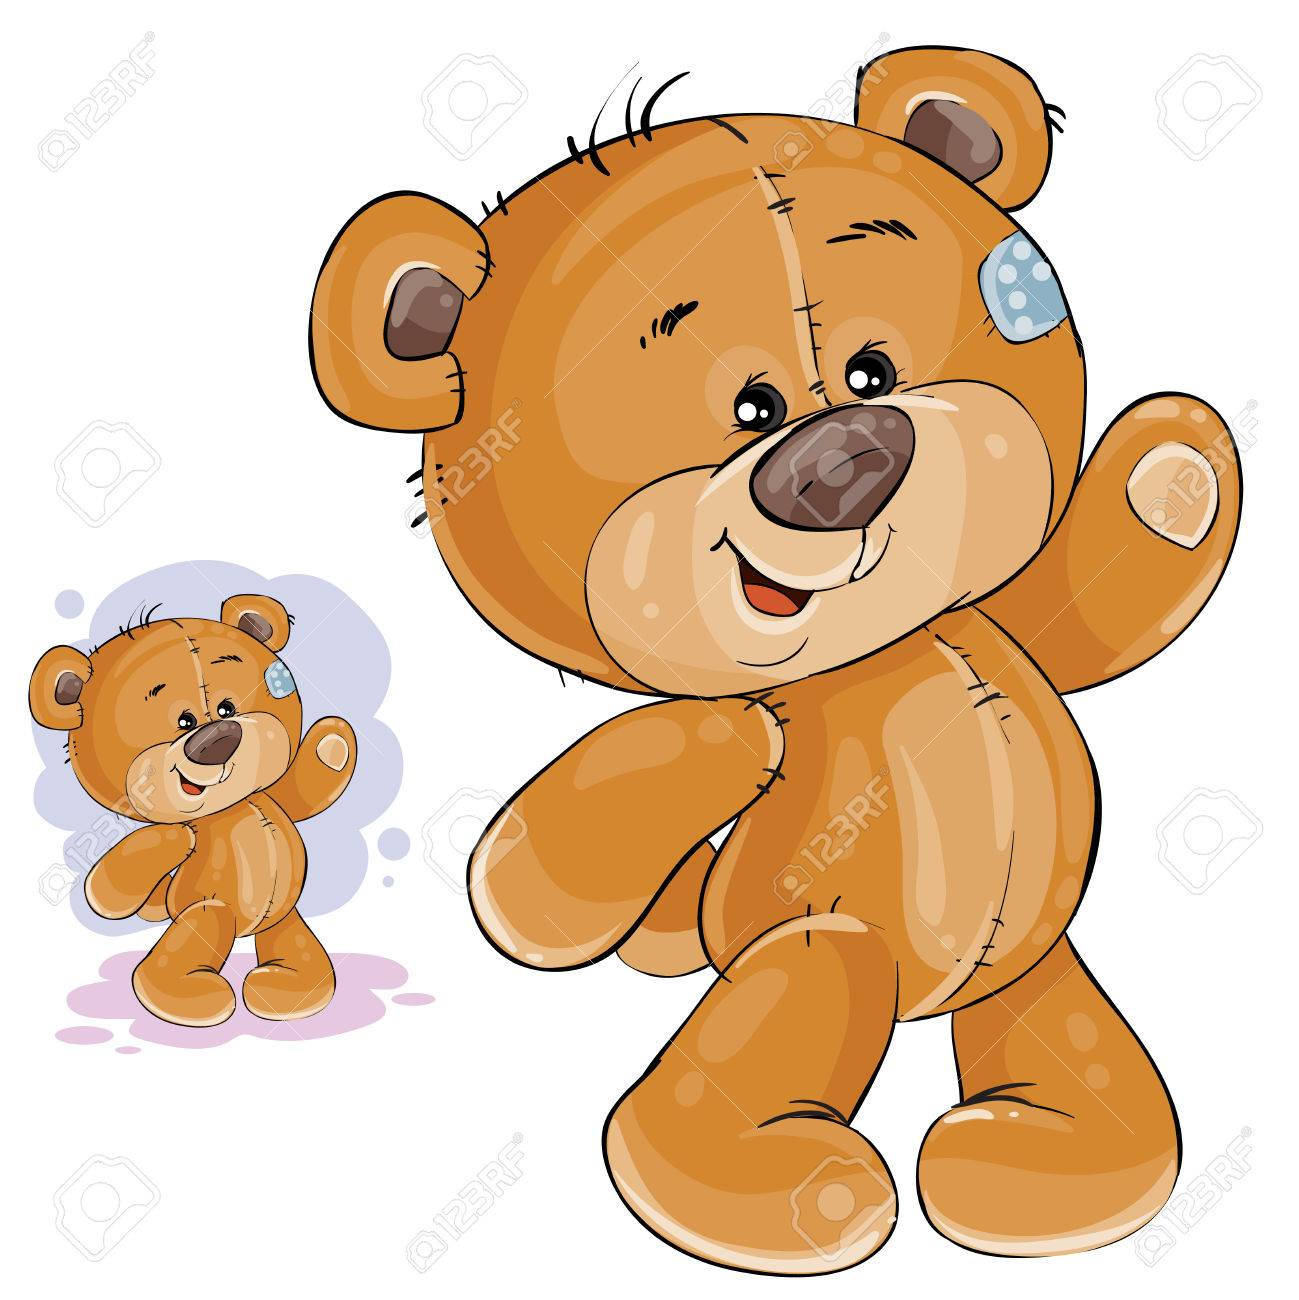 Vector clip art art illustration teddy bear waving its paw. Print, template, design element - 77628583